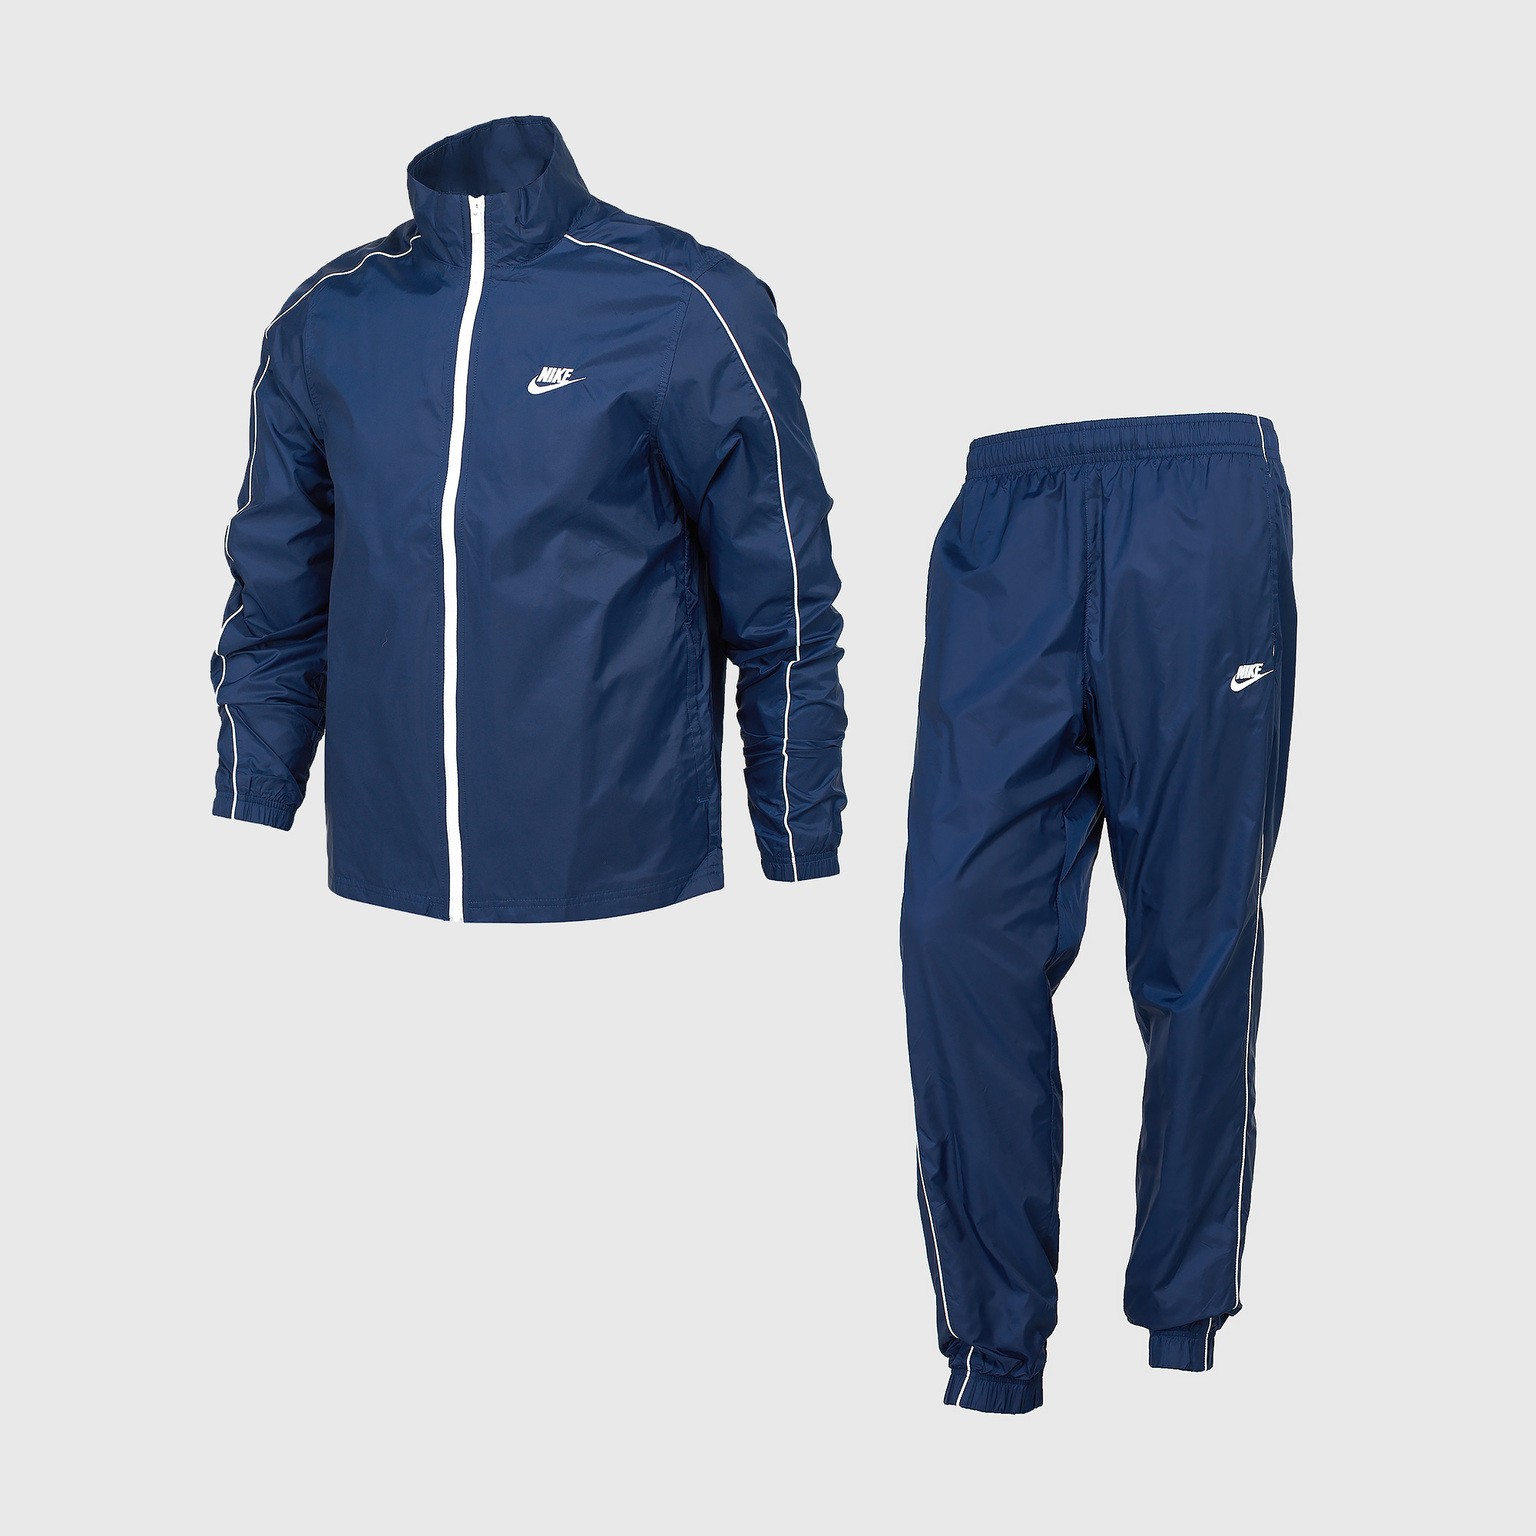 Костюм спортивный Nike Sportswear Woven Suit Basic BV3030-410